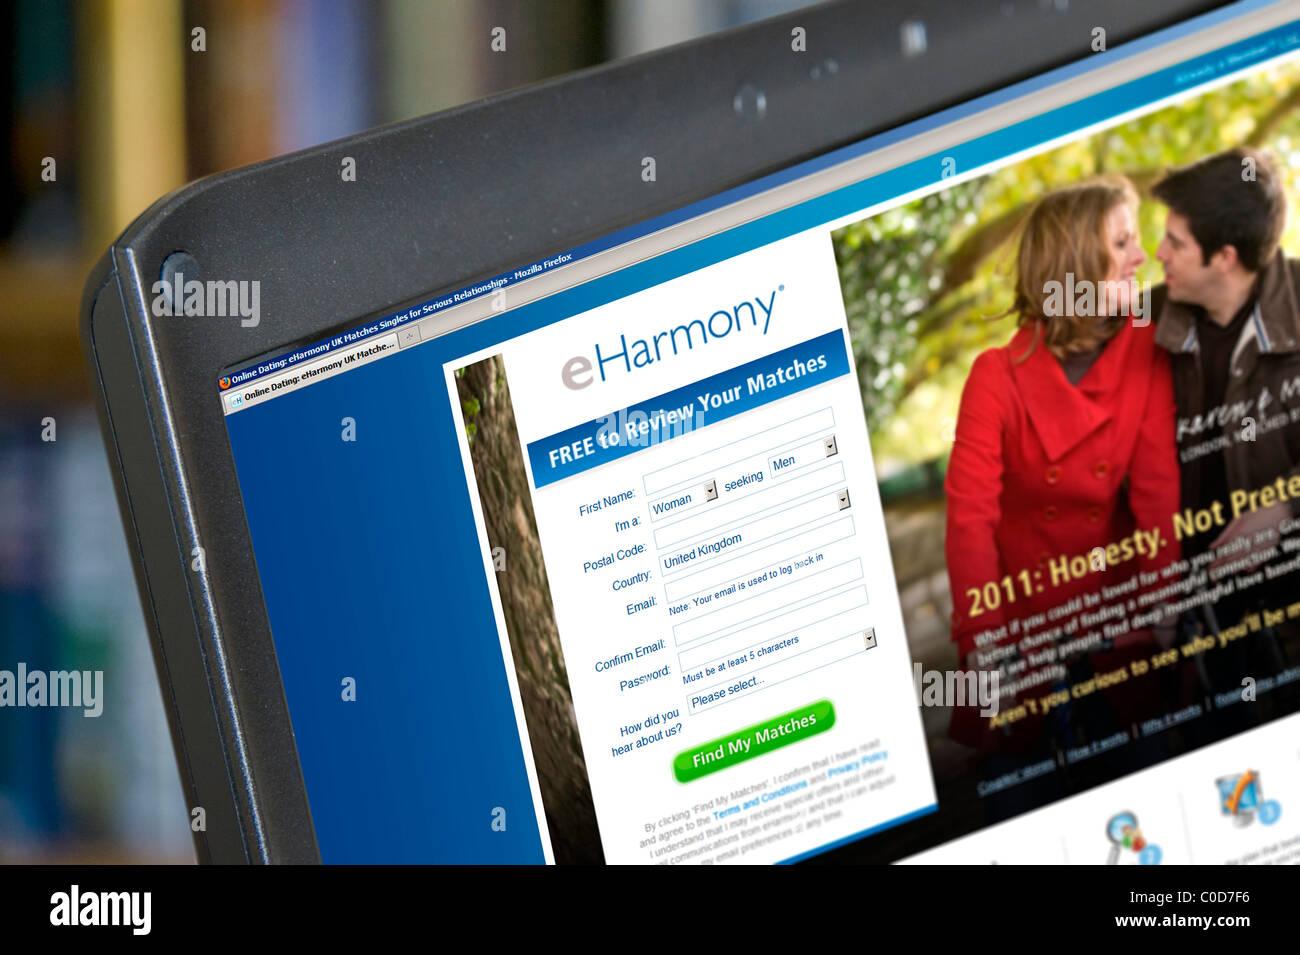 online dating sites virginia